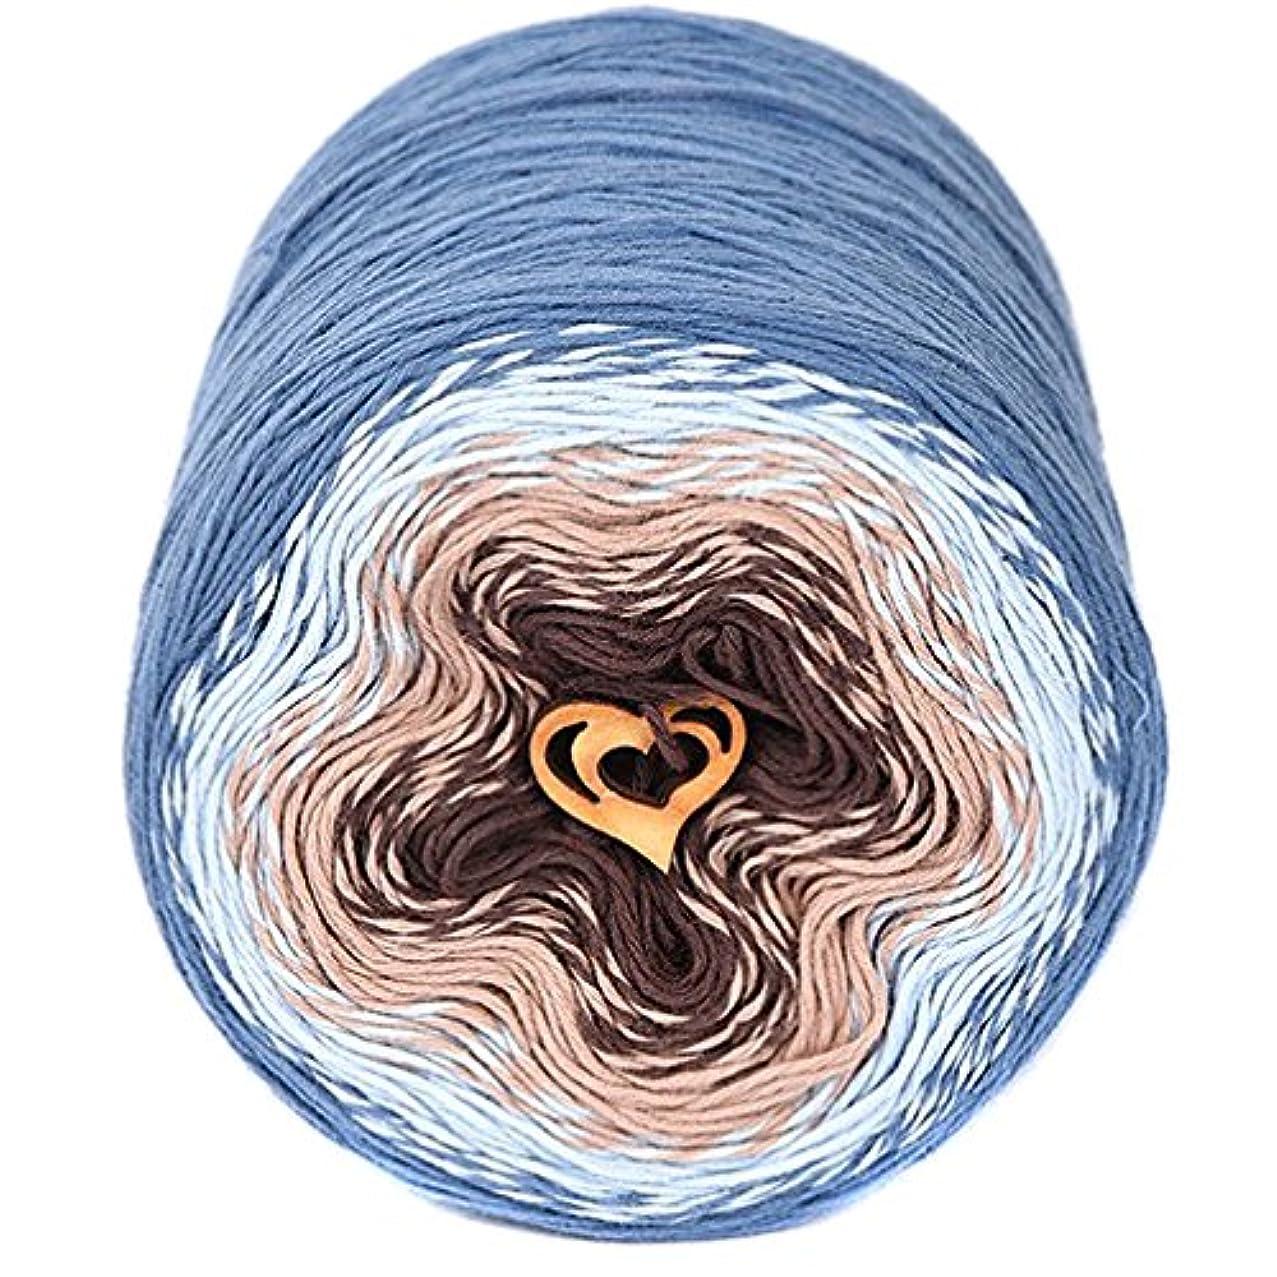 ZuzuHobby Unique Cotton Yarn, Multicolor, Wonderful Knitting Roll, Hand Knitting, Crocheting, 9,88 Ounces / 984 Yards (811)